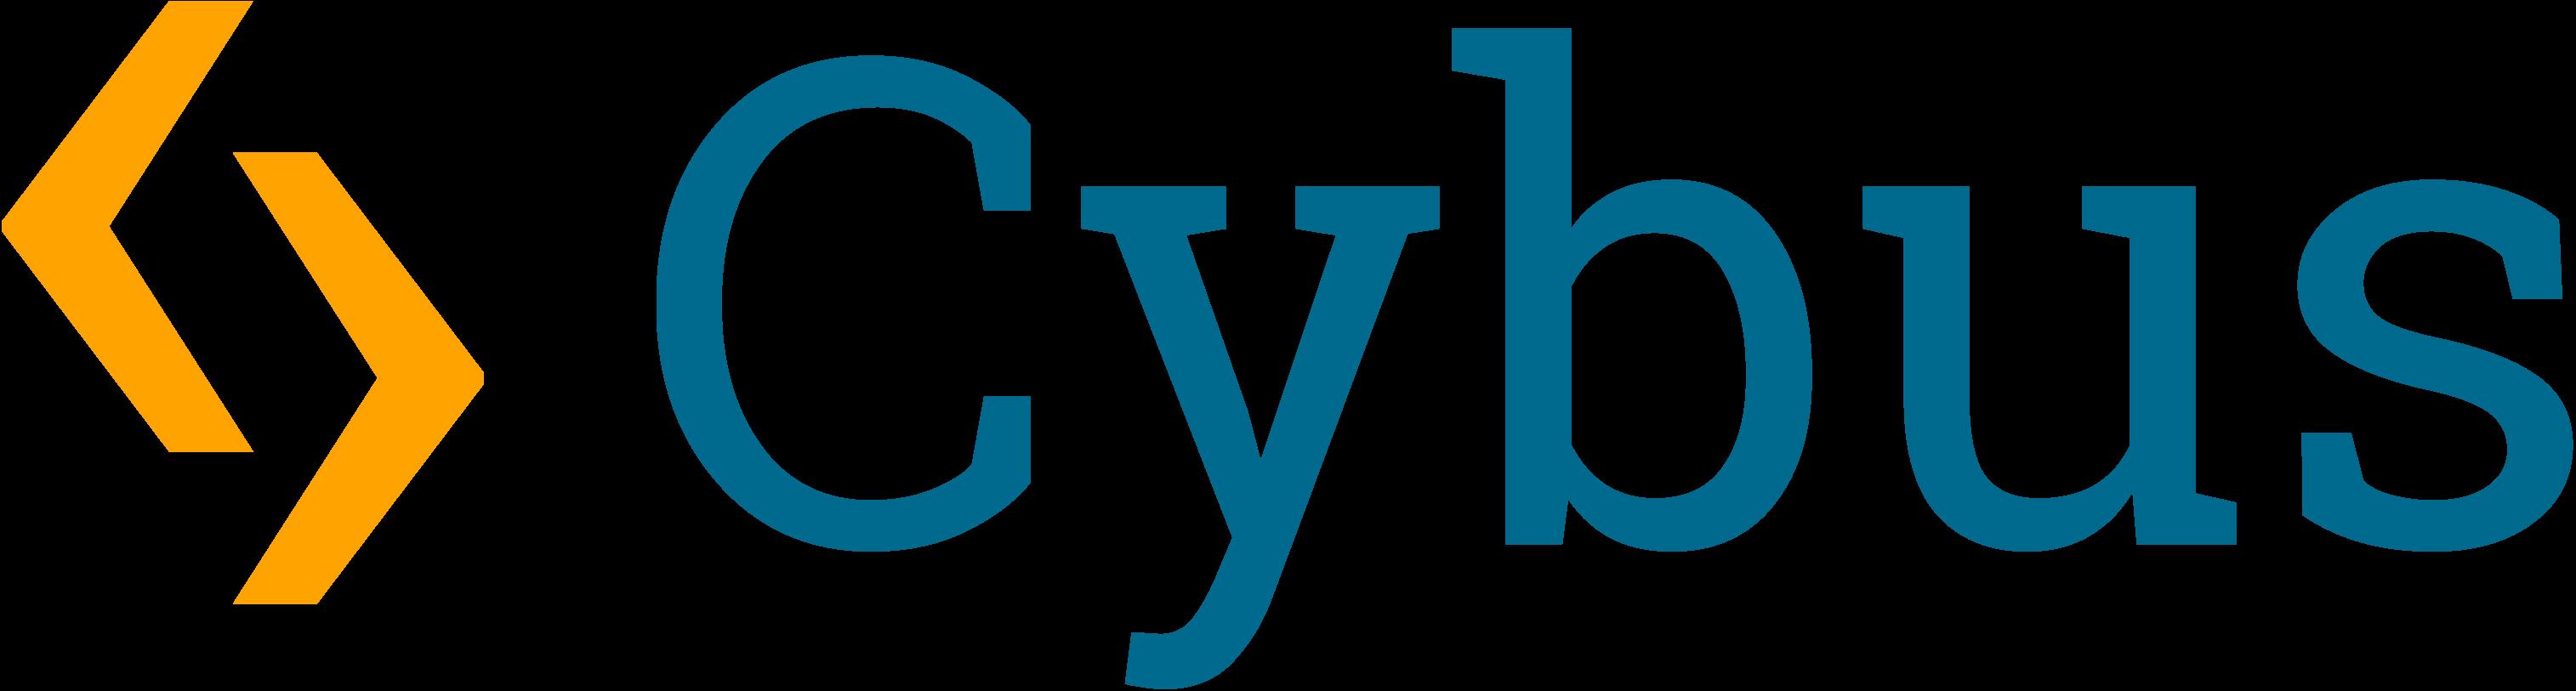 Cybus